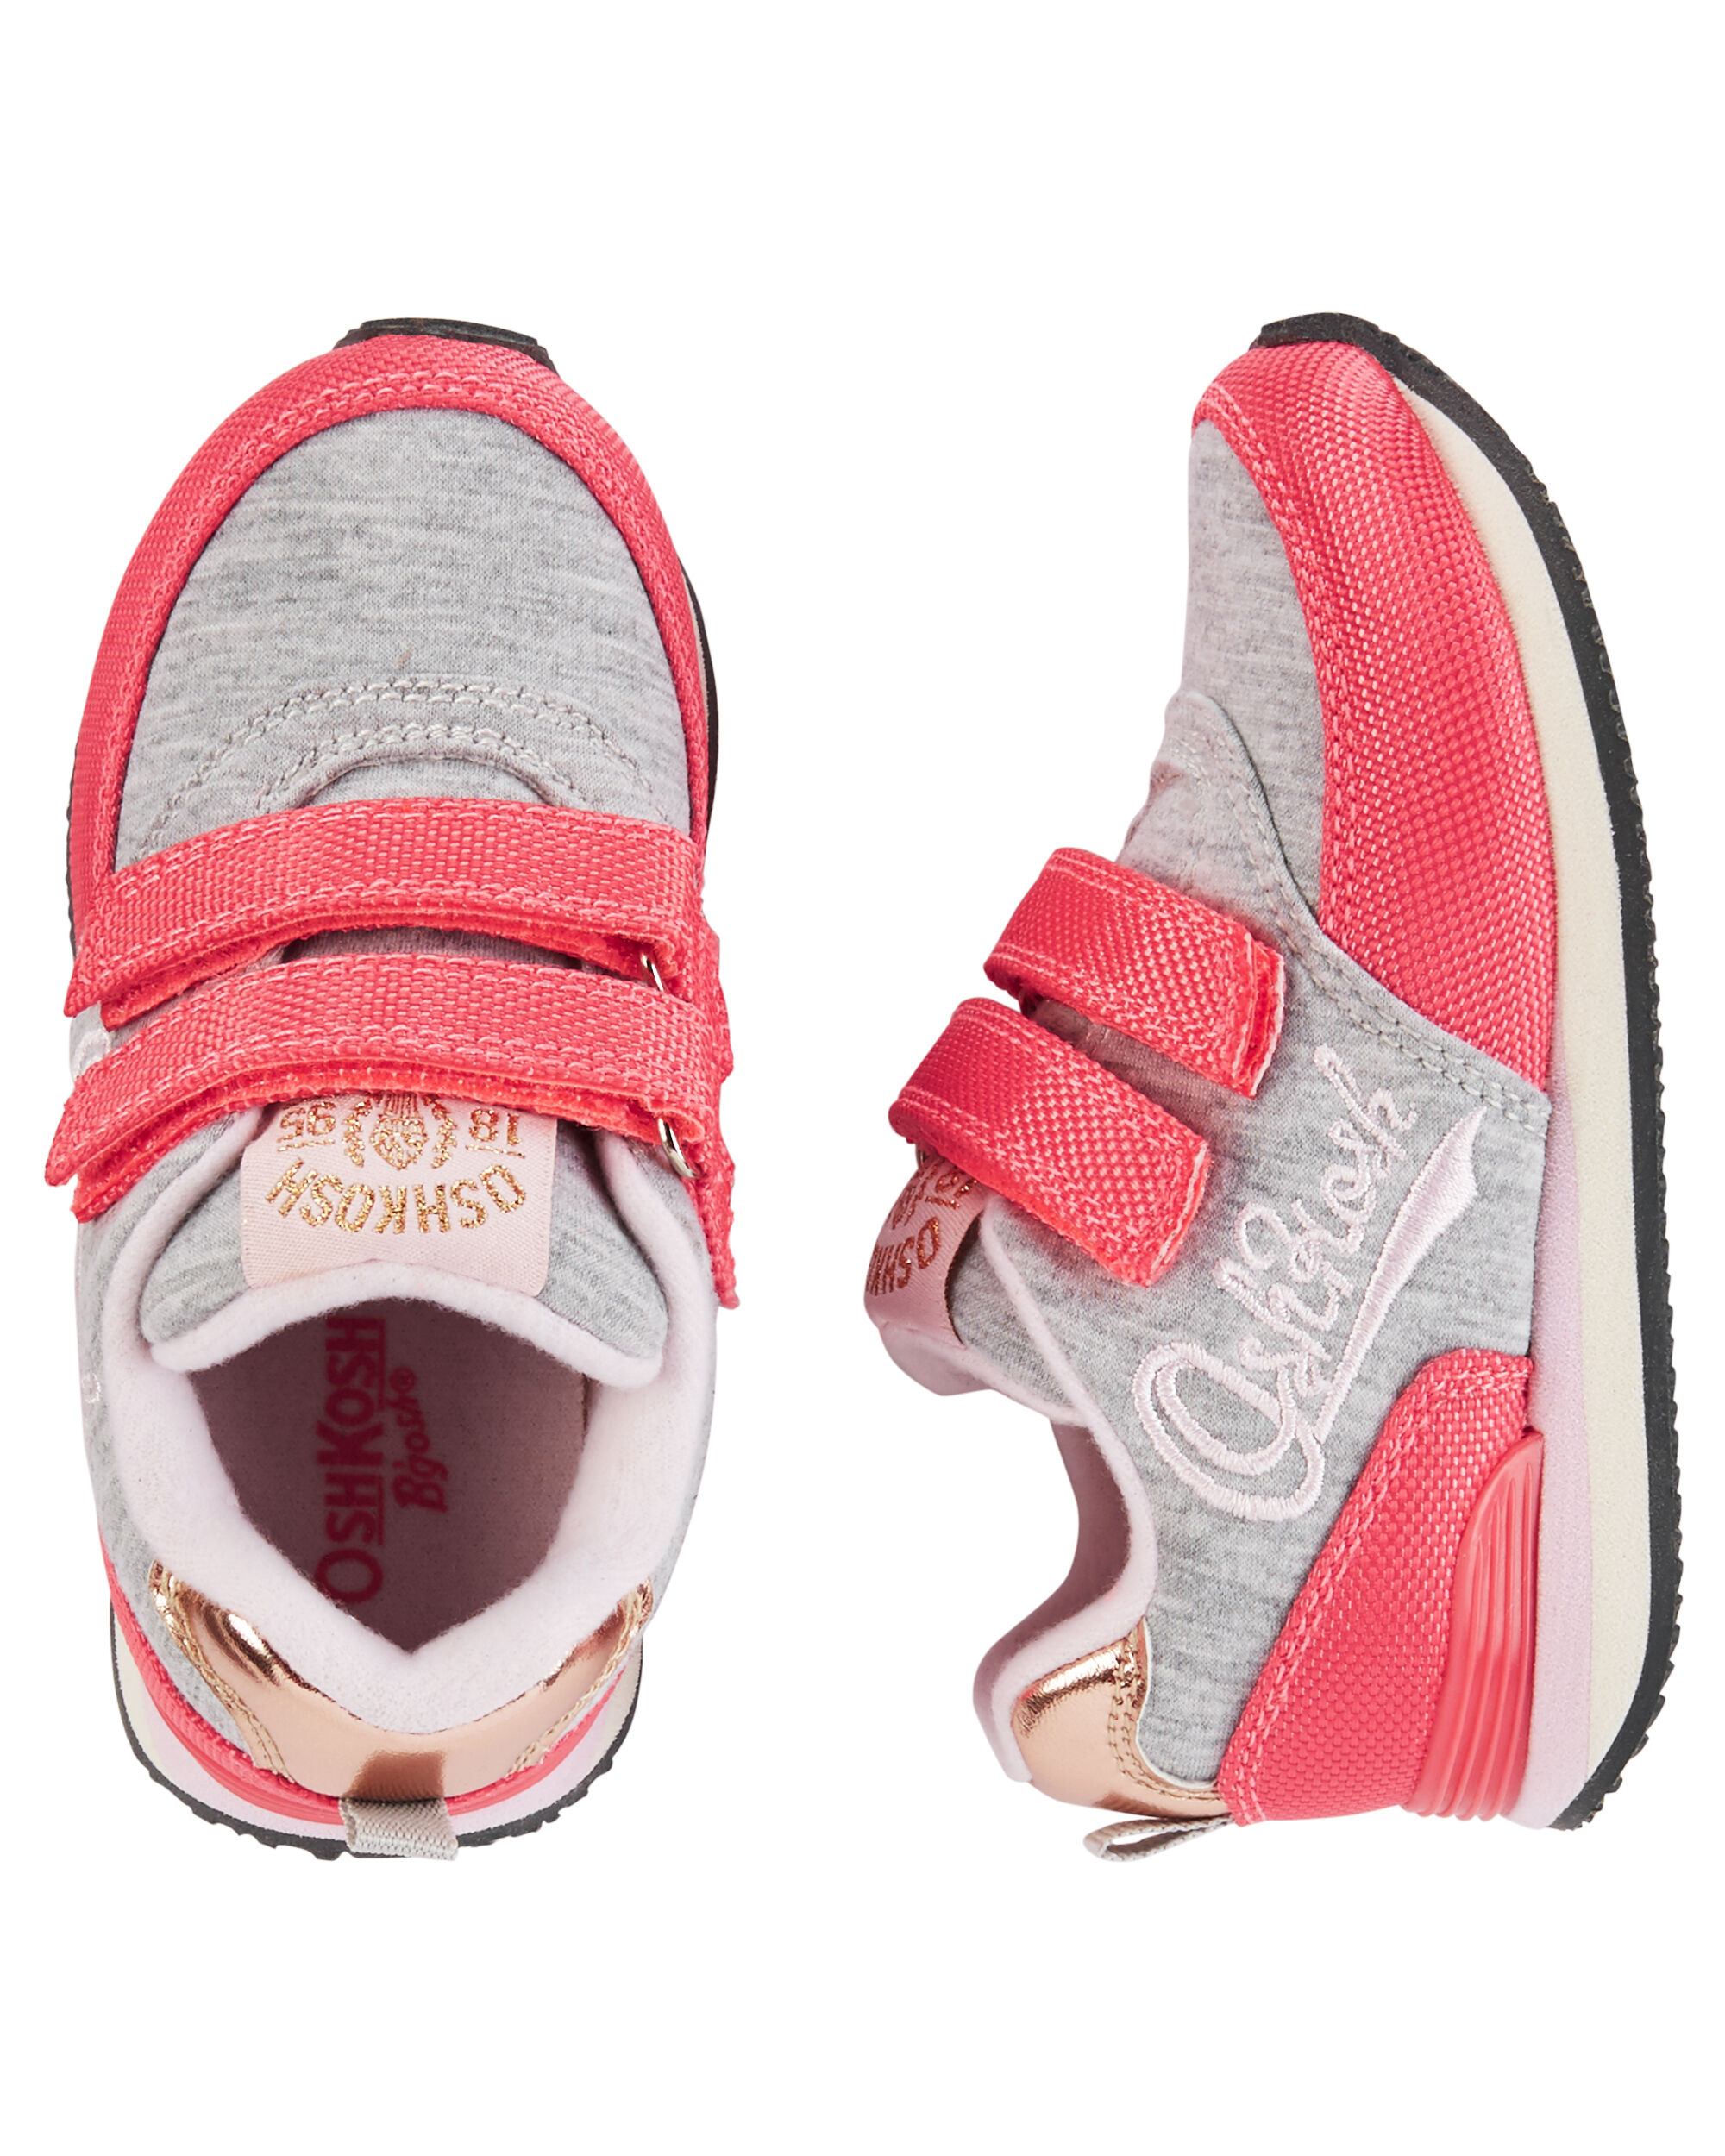 Toddler Girl OshKosh Sneakers